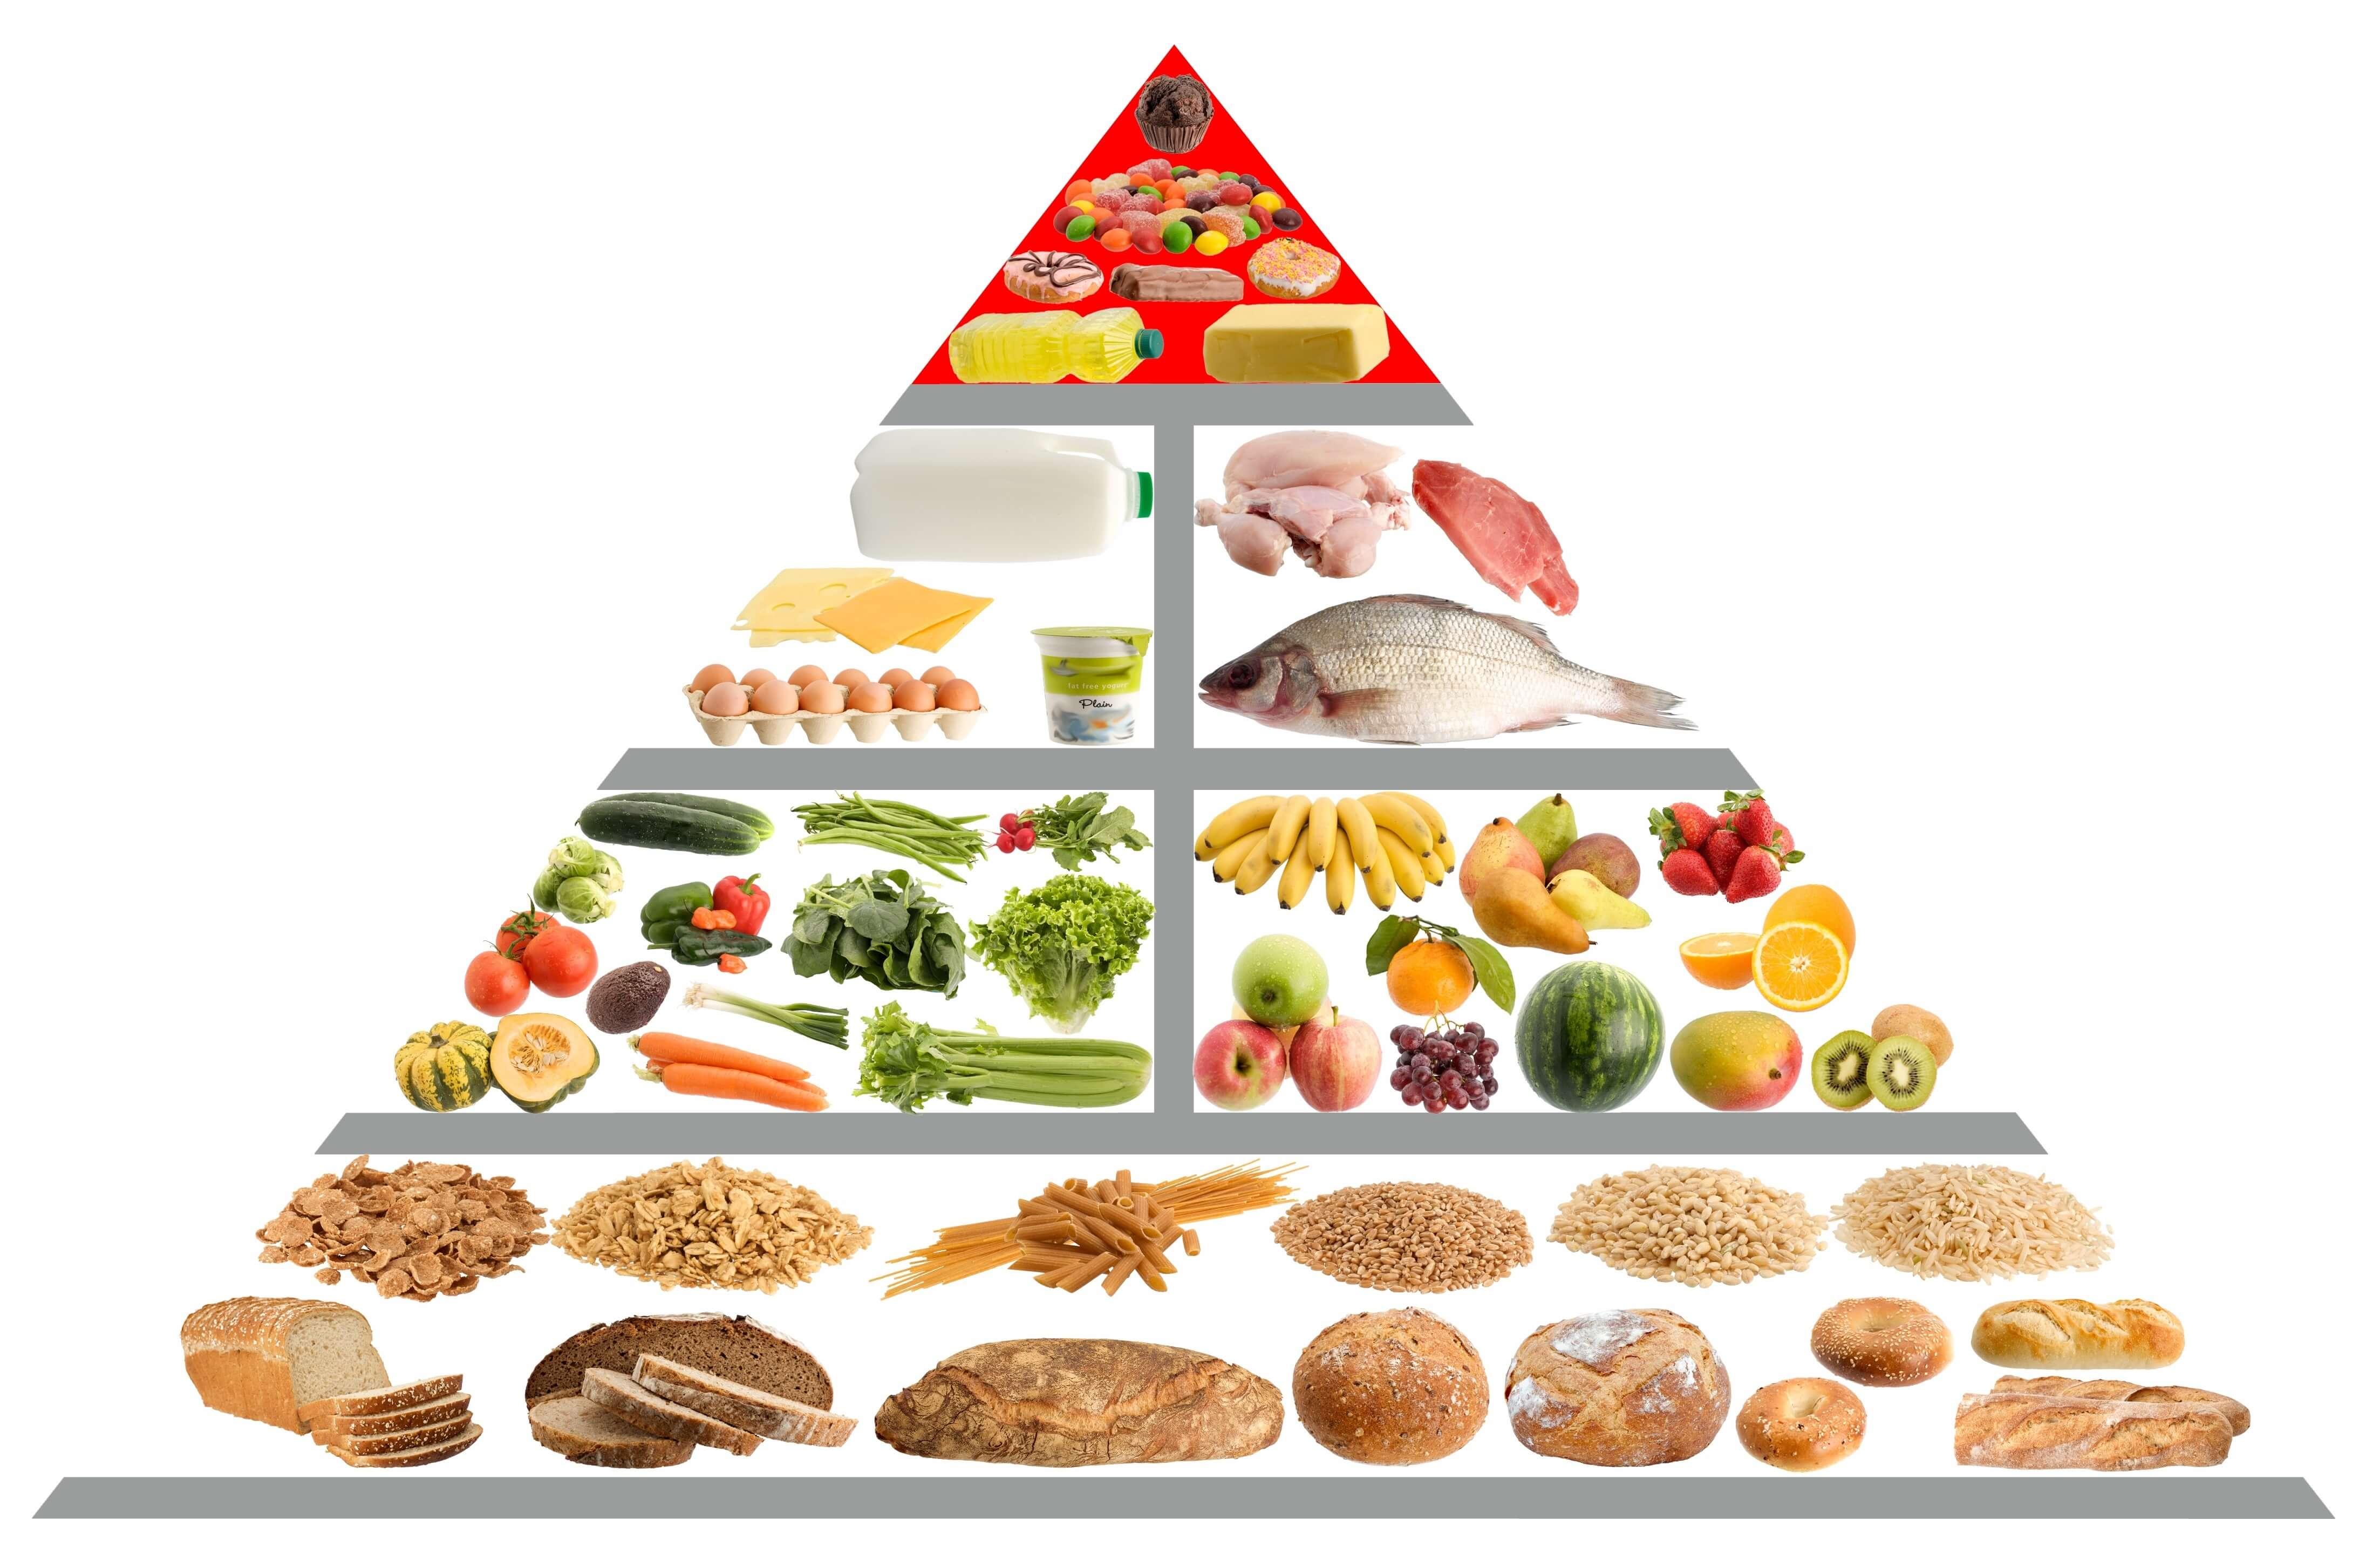 Die Ernährungspyramide